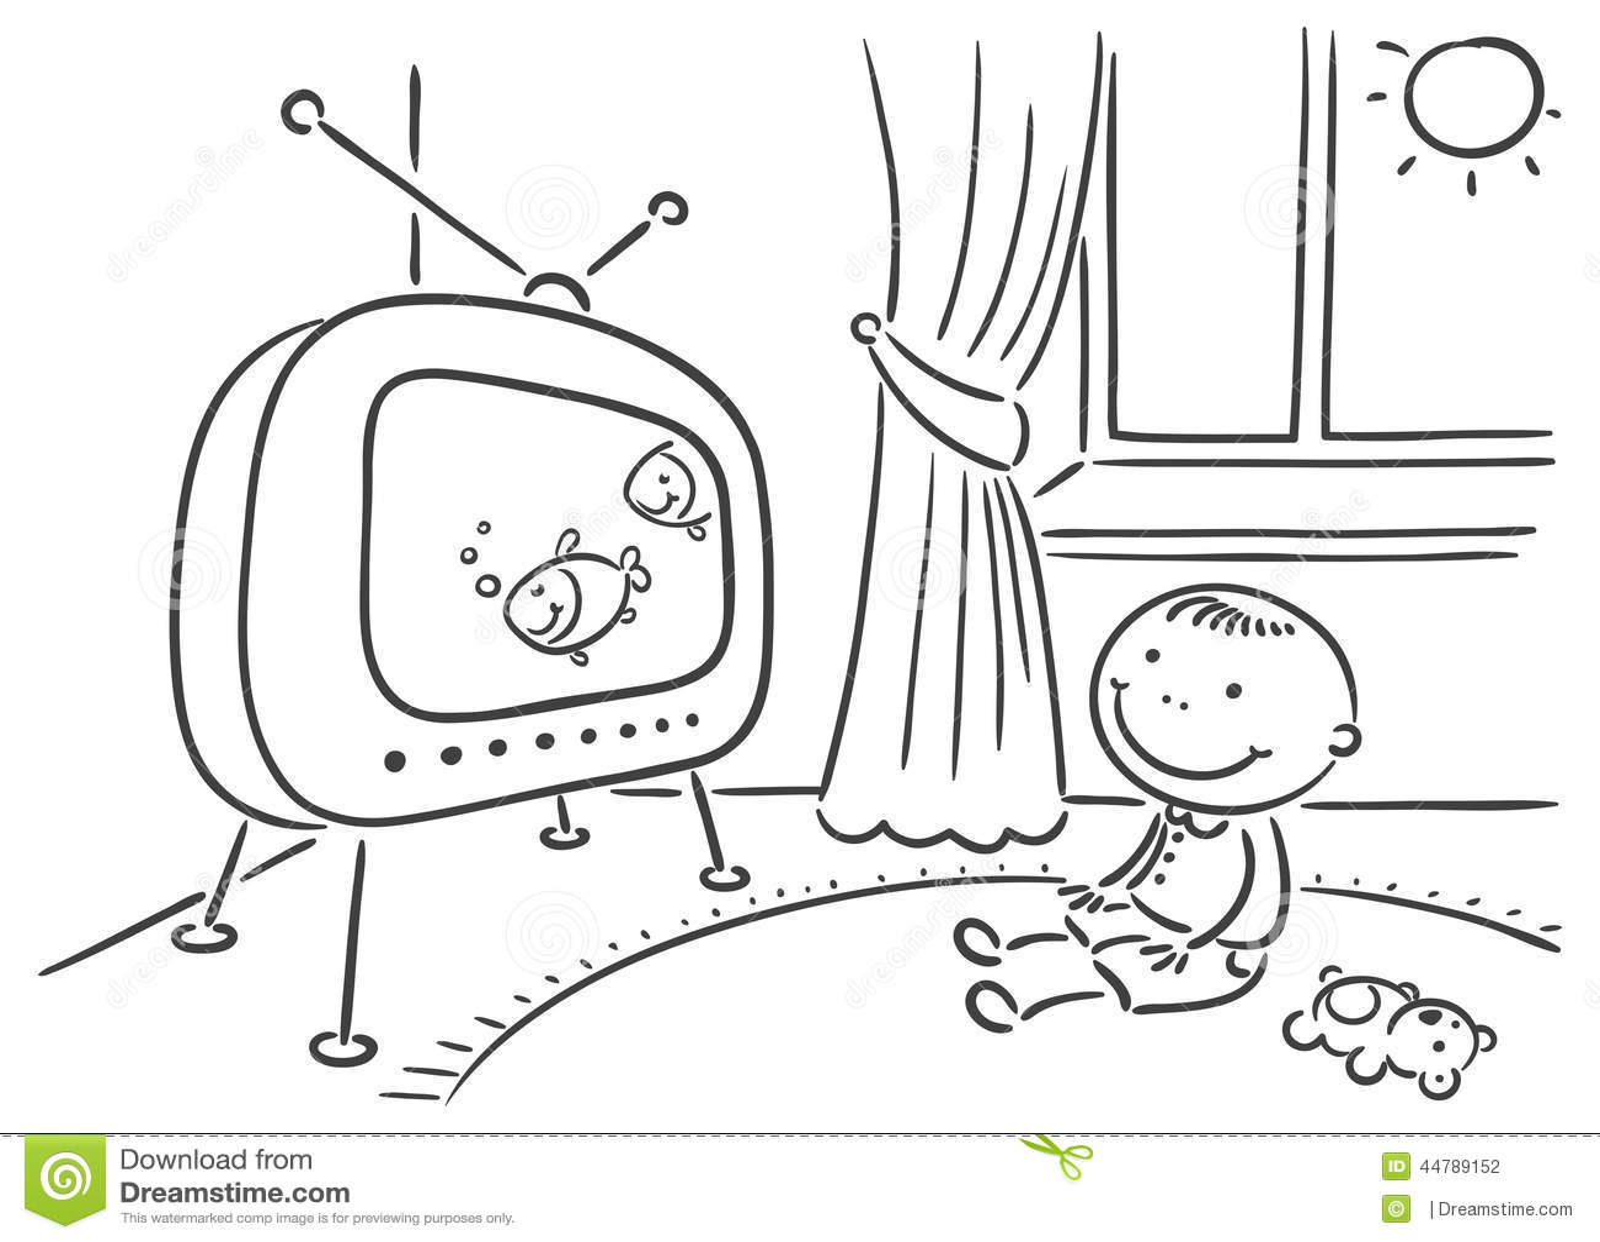 Enfant Regardant La TV Dans Sa Chambre Illustration de